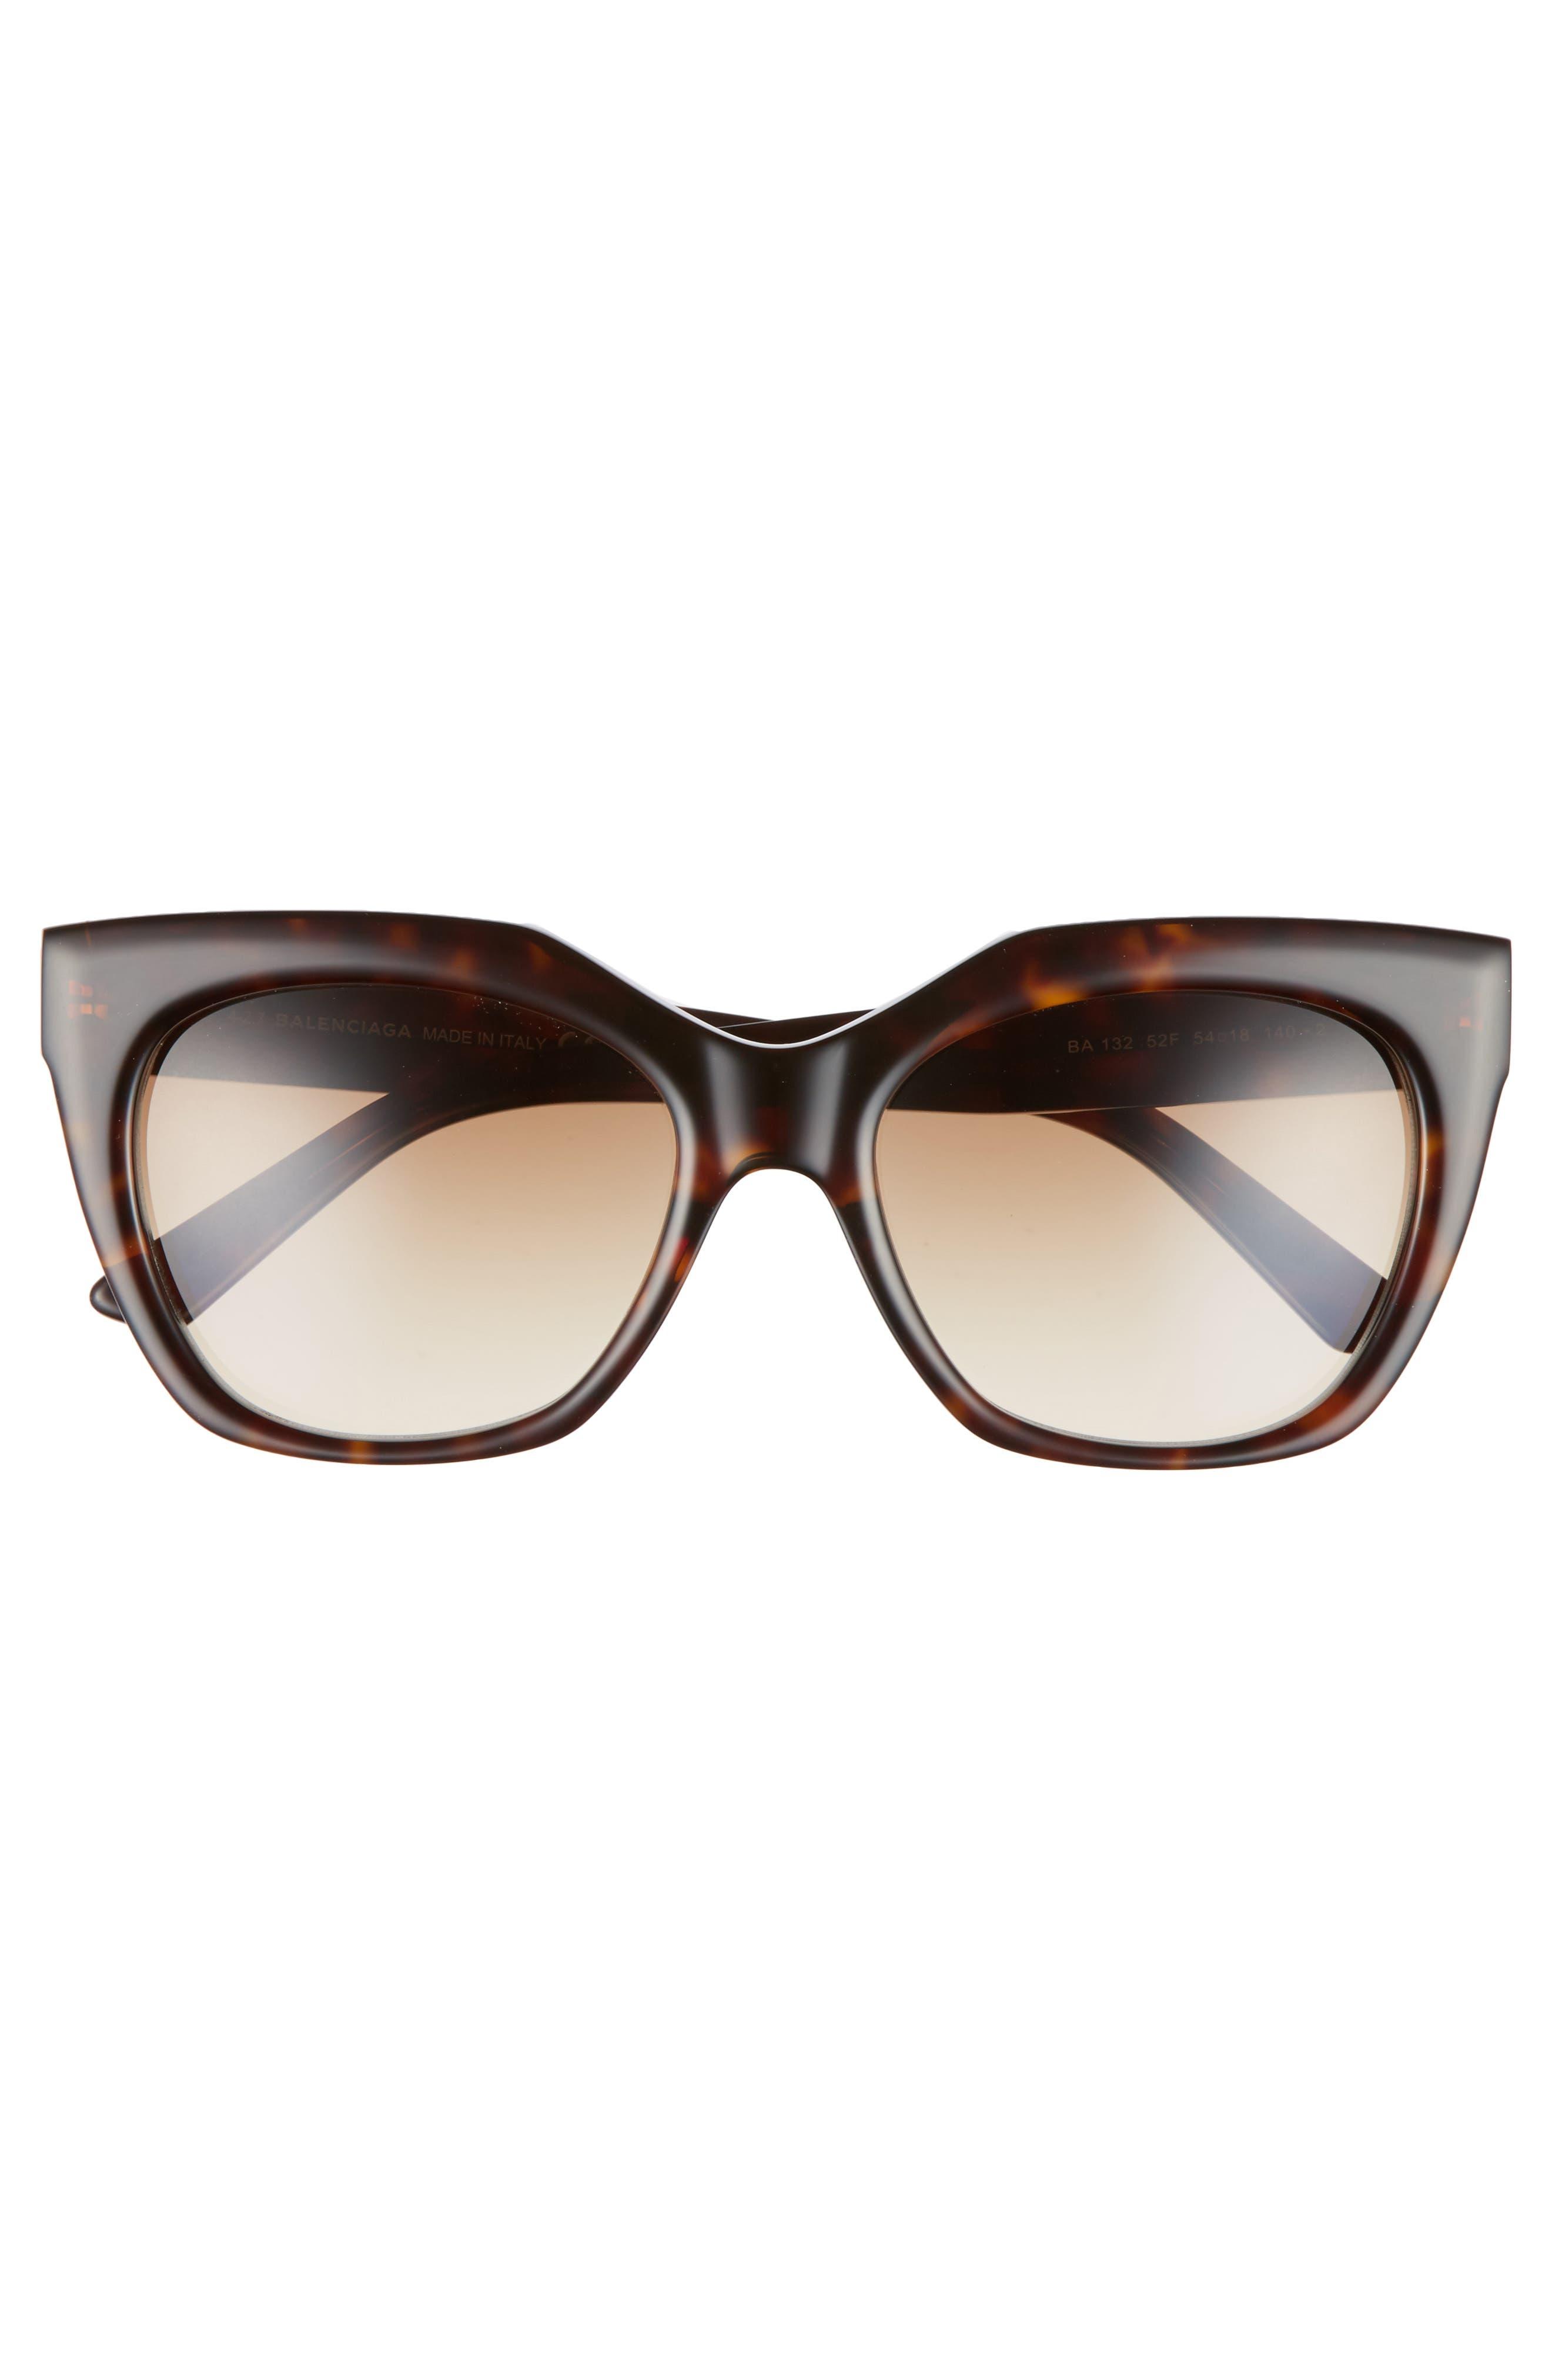 54mm Cat Eye Sunglasses,                             Alternate thumbnail 3, color,                             DARK HAVANA/ GRADIENT BROWN